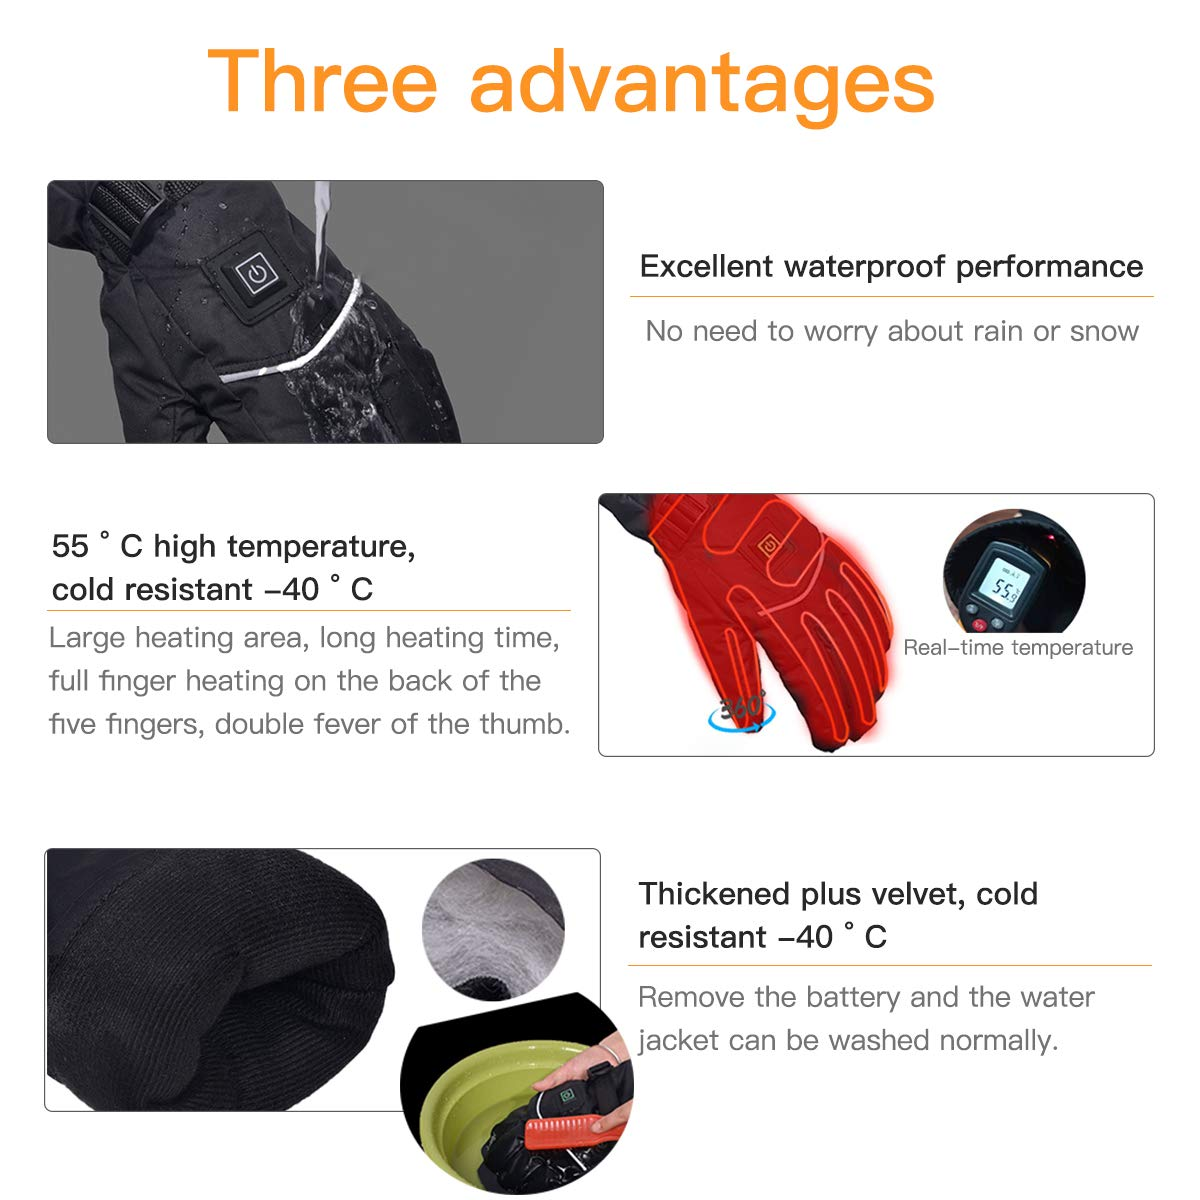 GDCB Guanti riscaldati elettrici Guanti Termici Touchscreen alimentati a Batteria Ricaricabili Impermeabili con Striscia Riflettente per Escursionismo Sci Scaldamani da Caccia